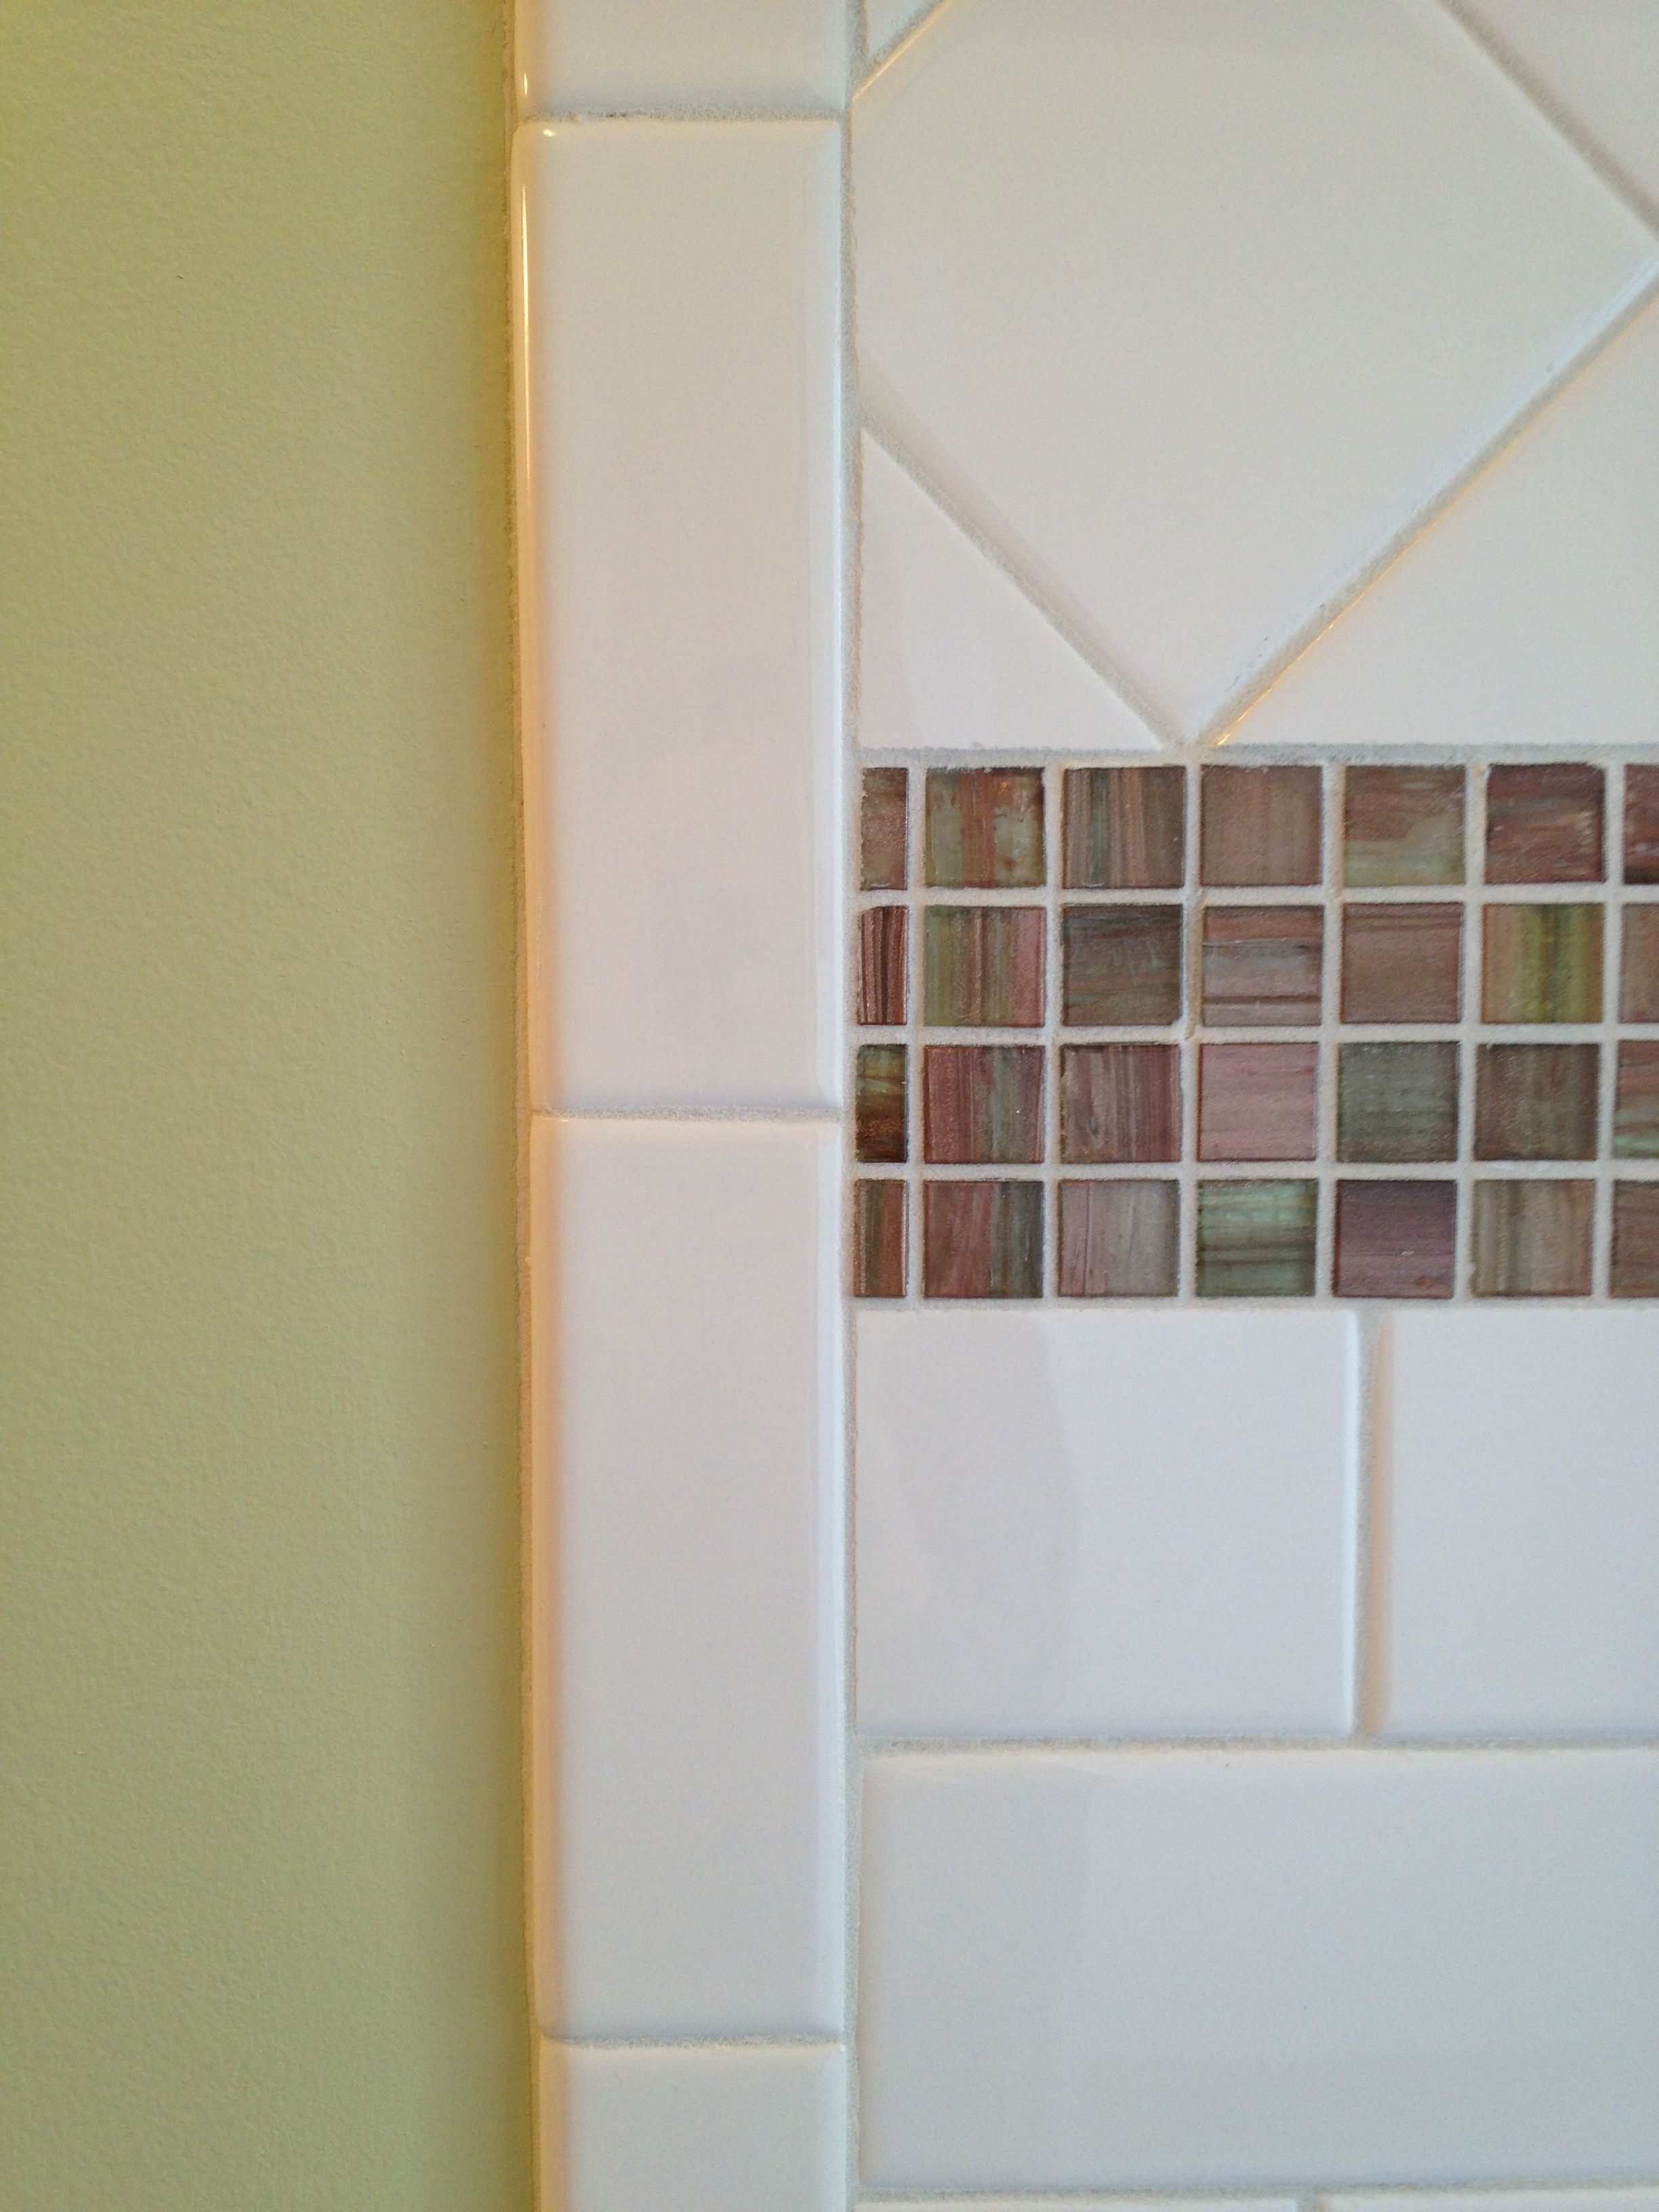 Decorative Bathroom Tile New Decorative Tiles For Walls Exquisite ...